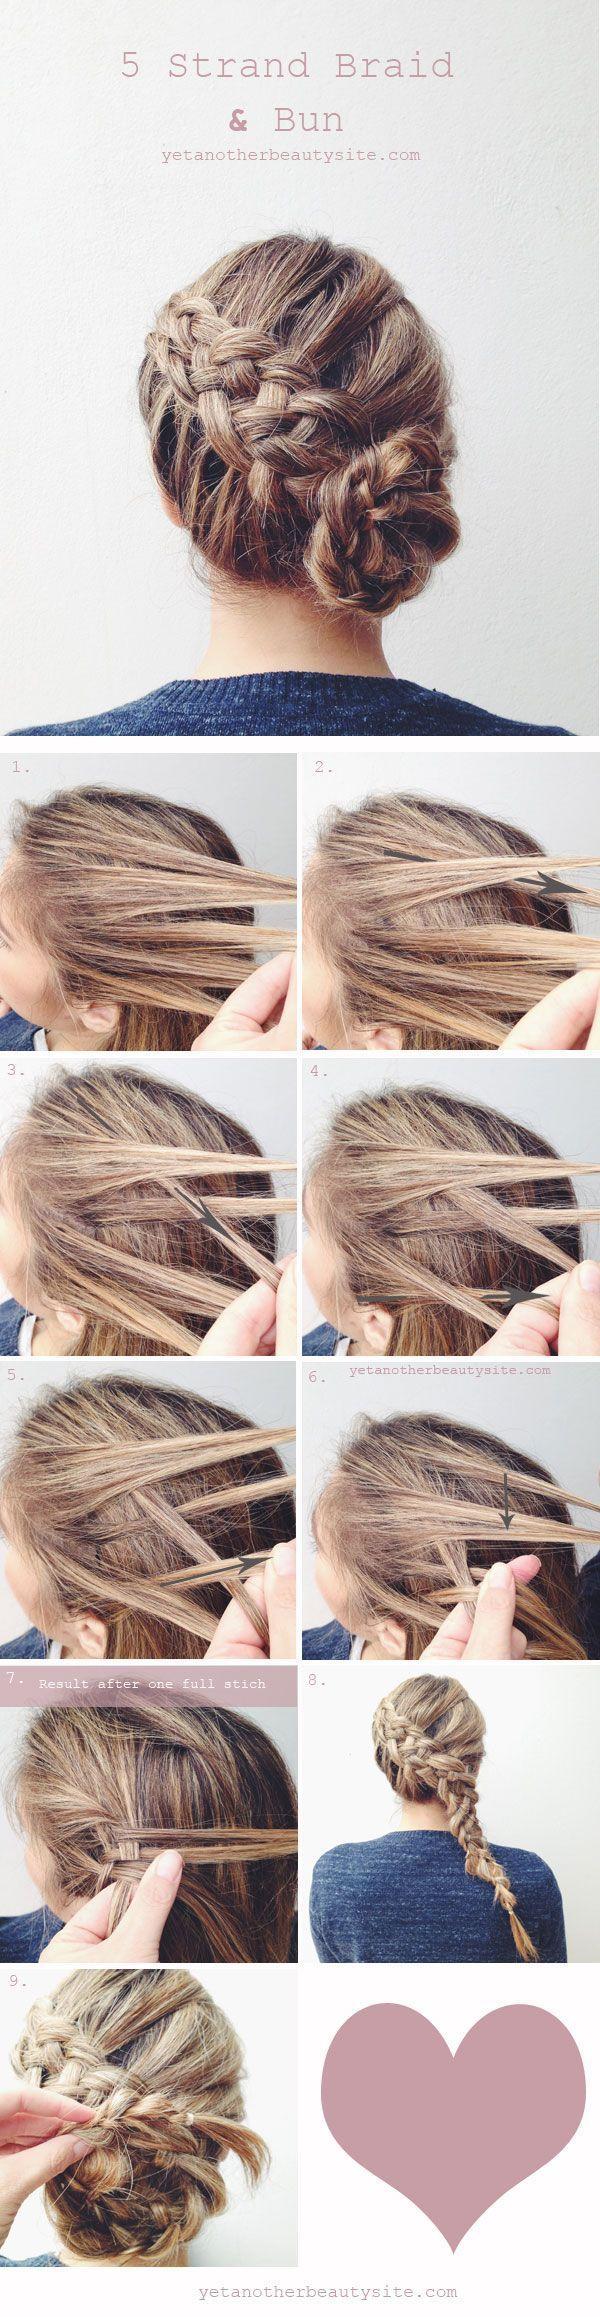 diy 5 strand braid and bun wedding hairstyles